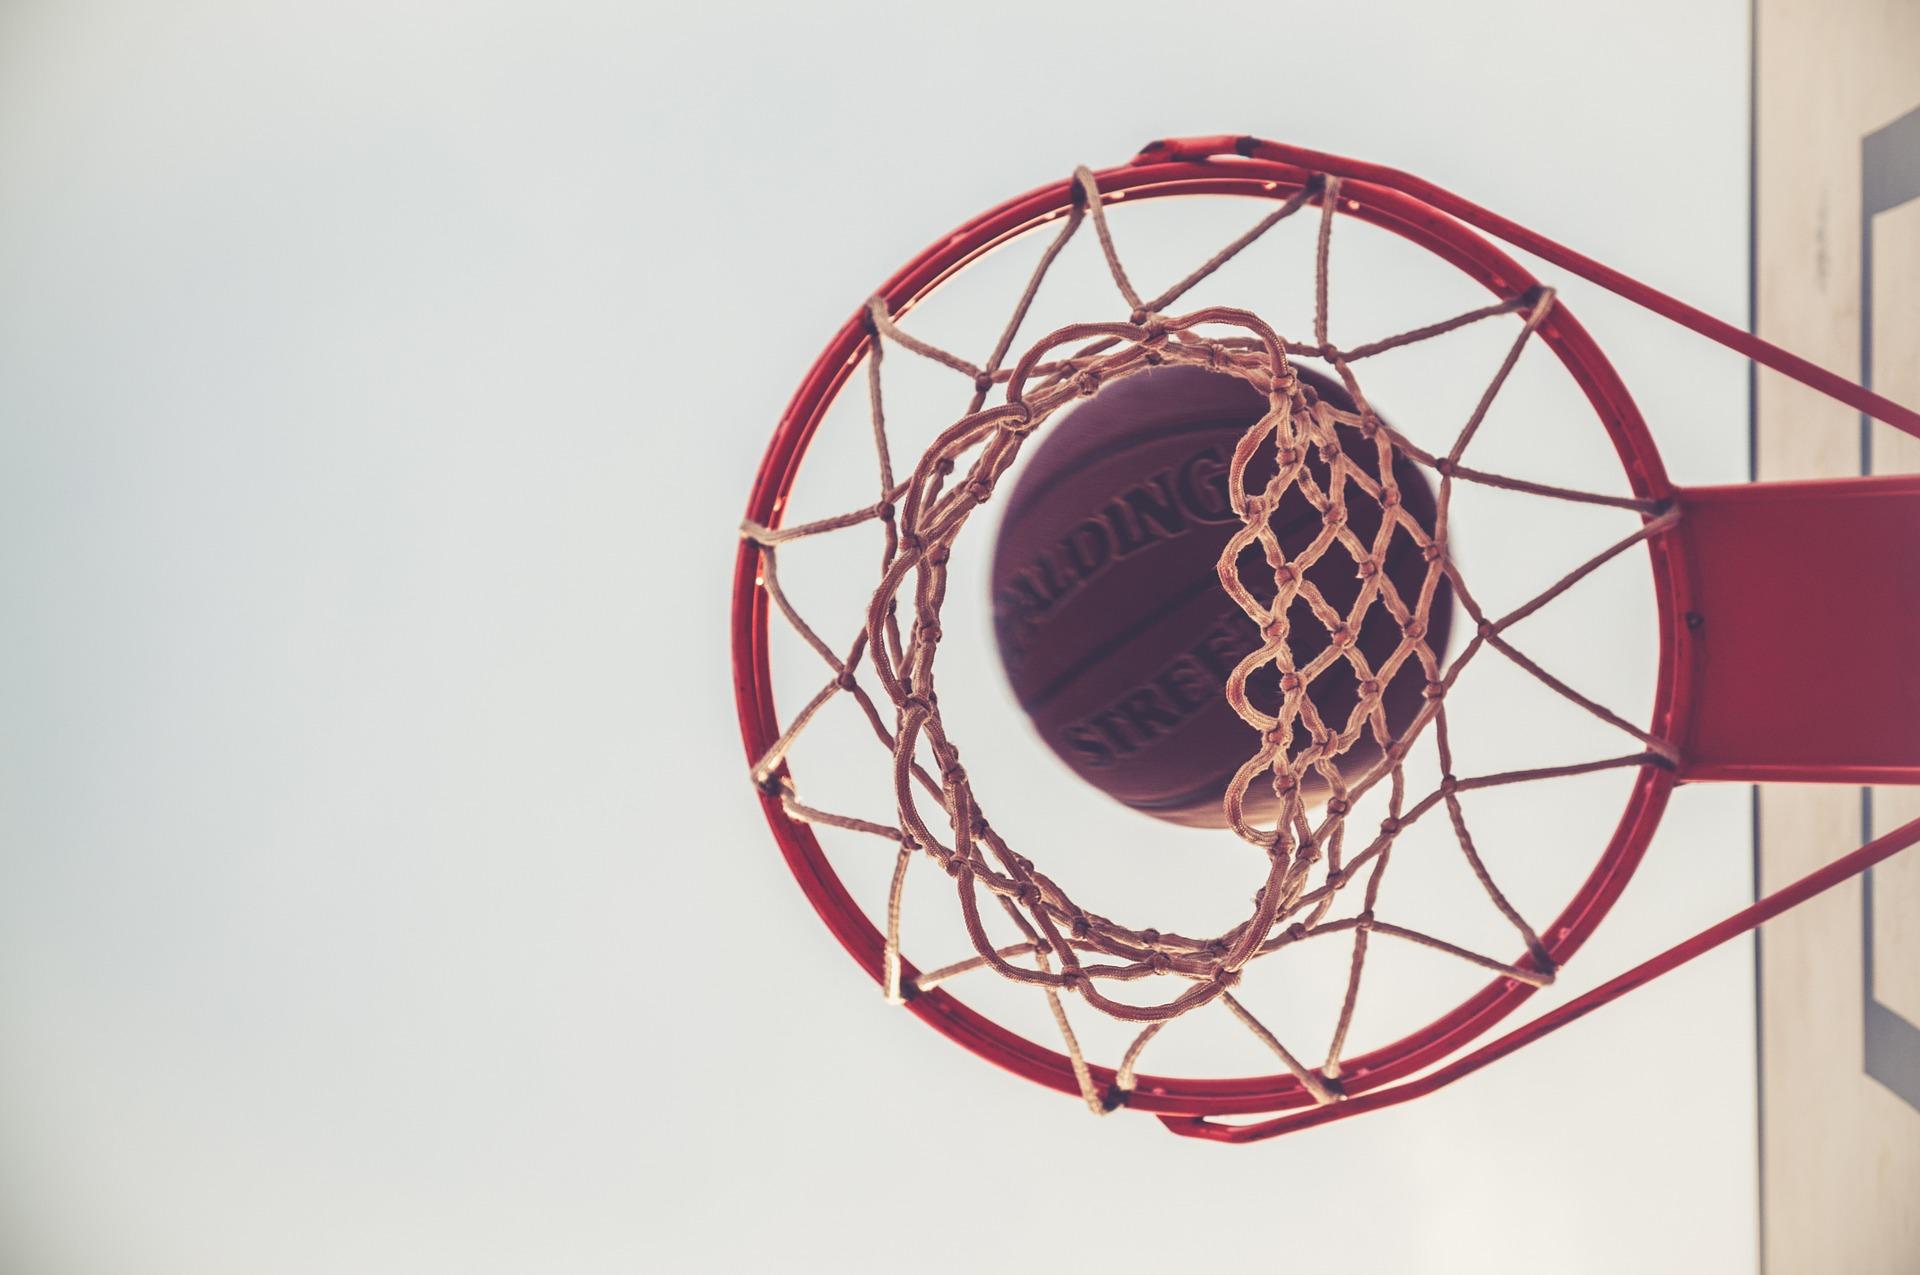 basket-801708_1920_1517264371683.jpg